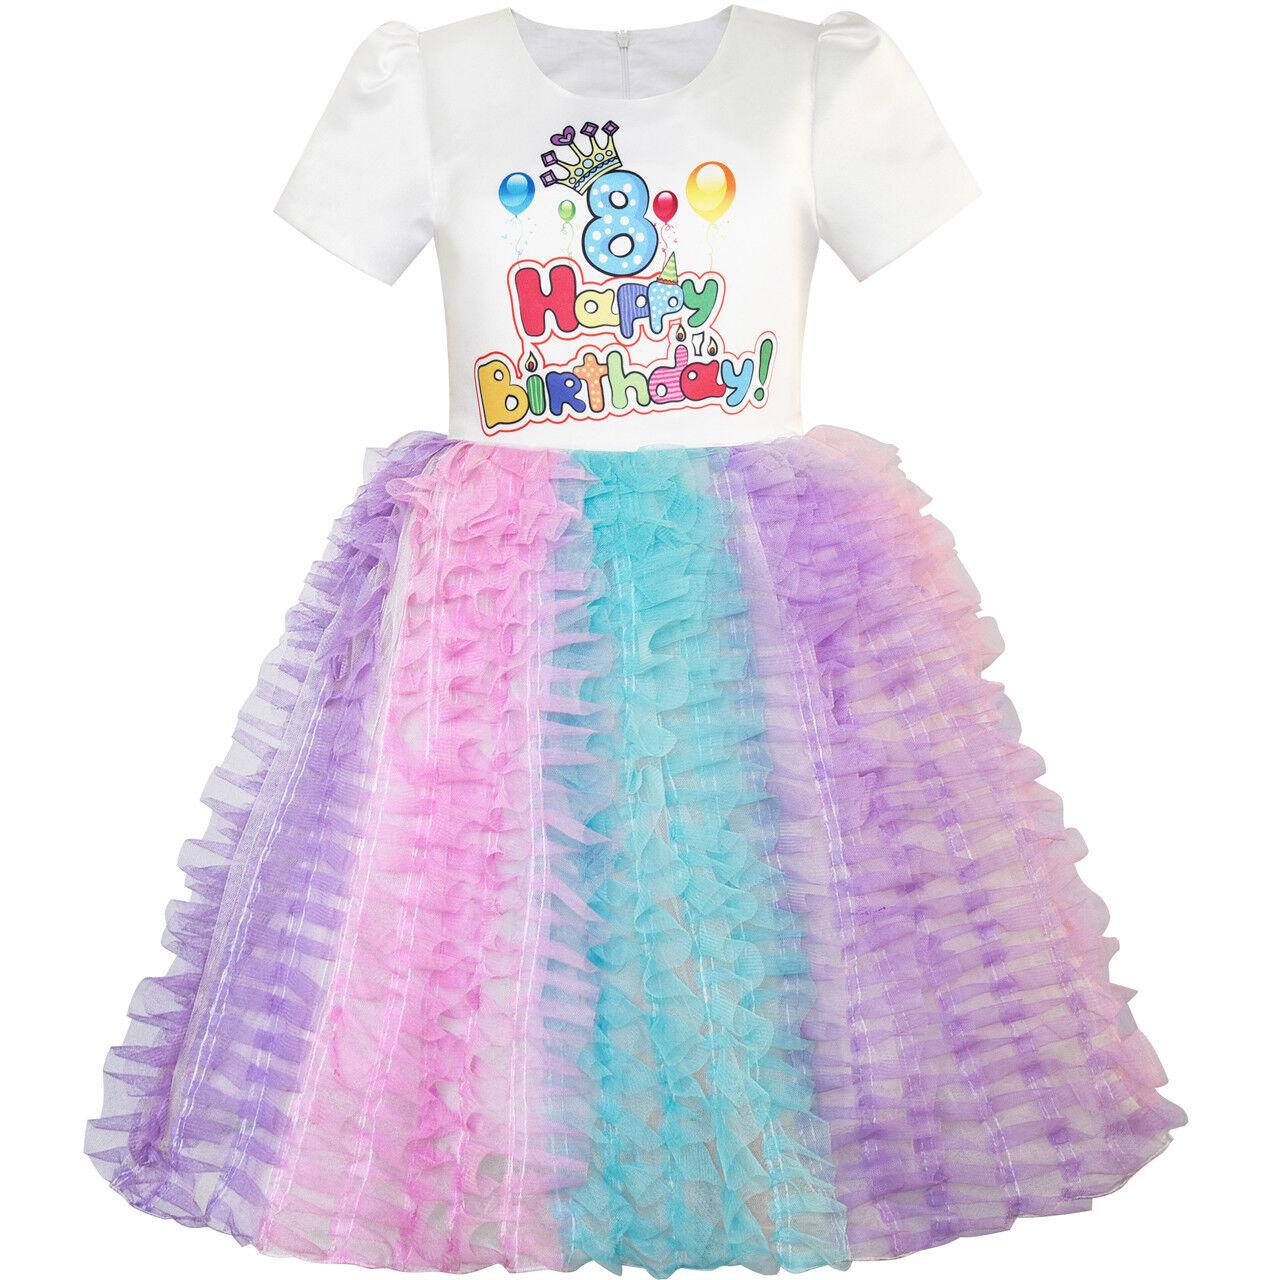 1st Birthday Princess Dress.Details About Flower Girl Dress Happy Birthday Princess Party 1st Birthday Tutu Dress Size 1 8